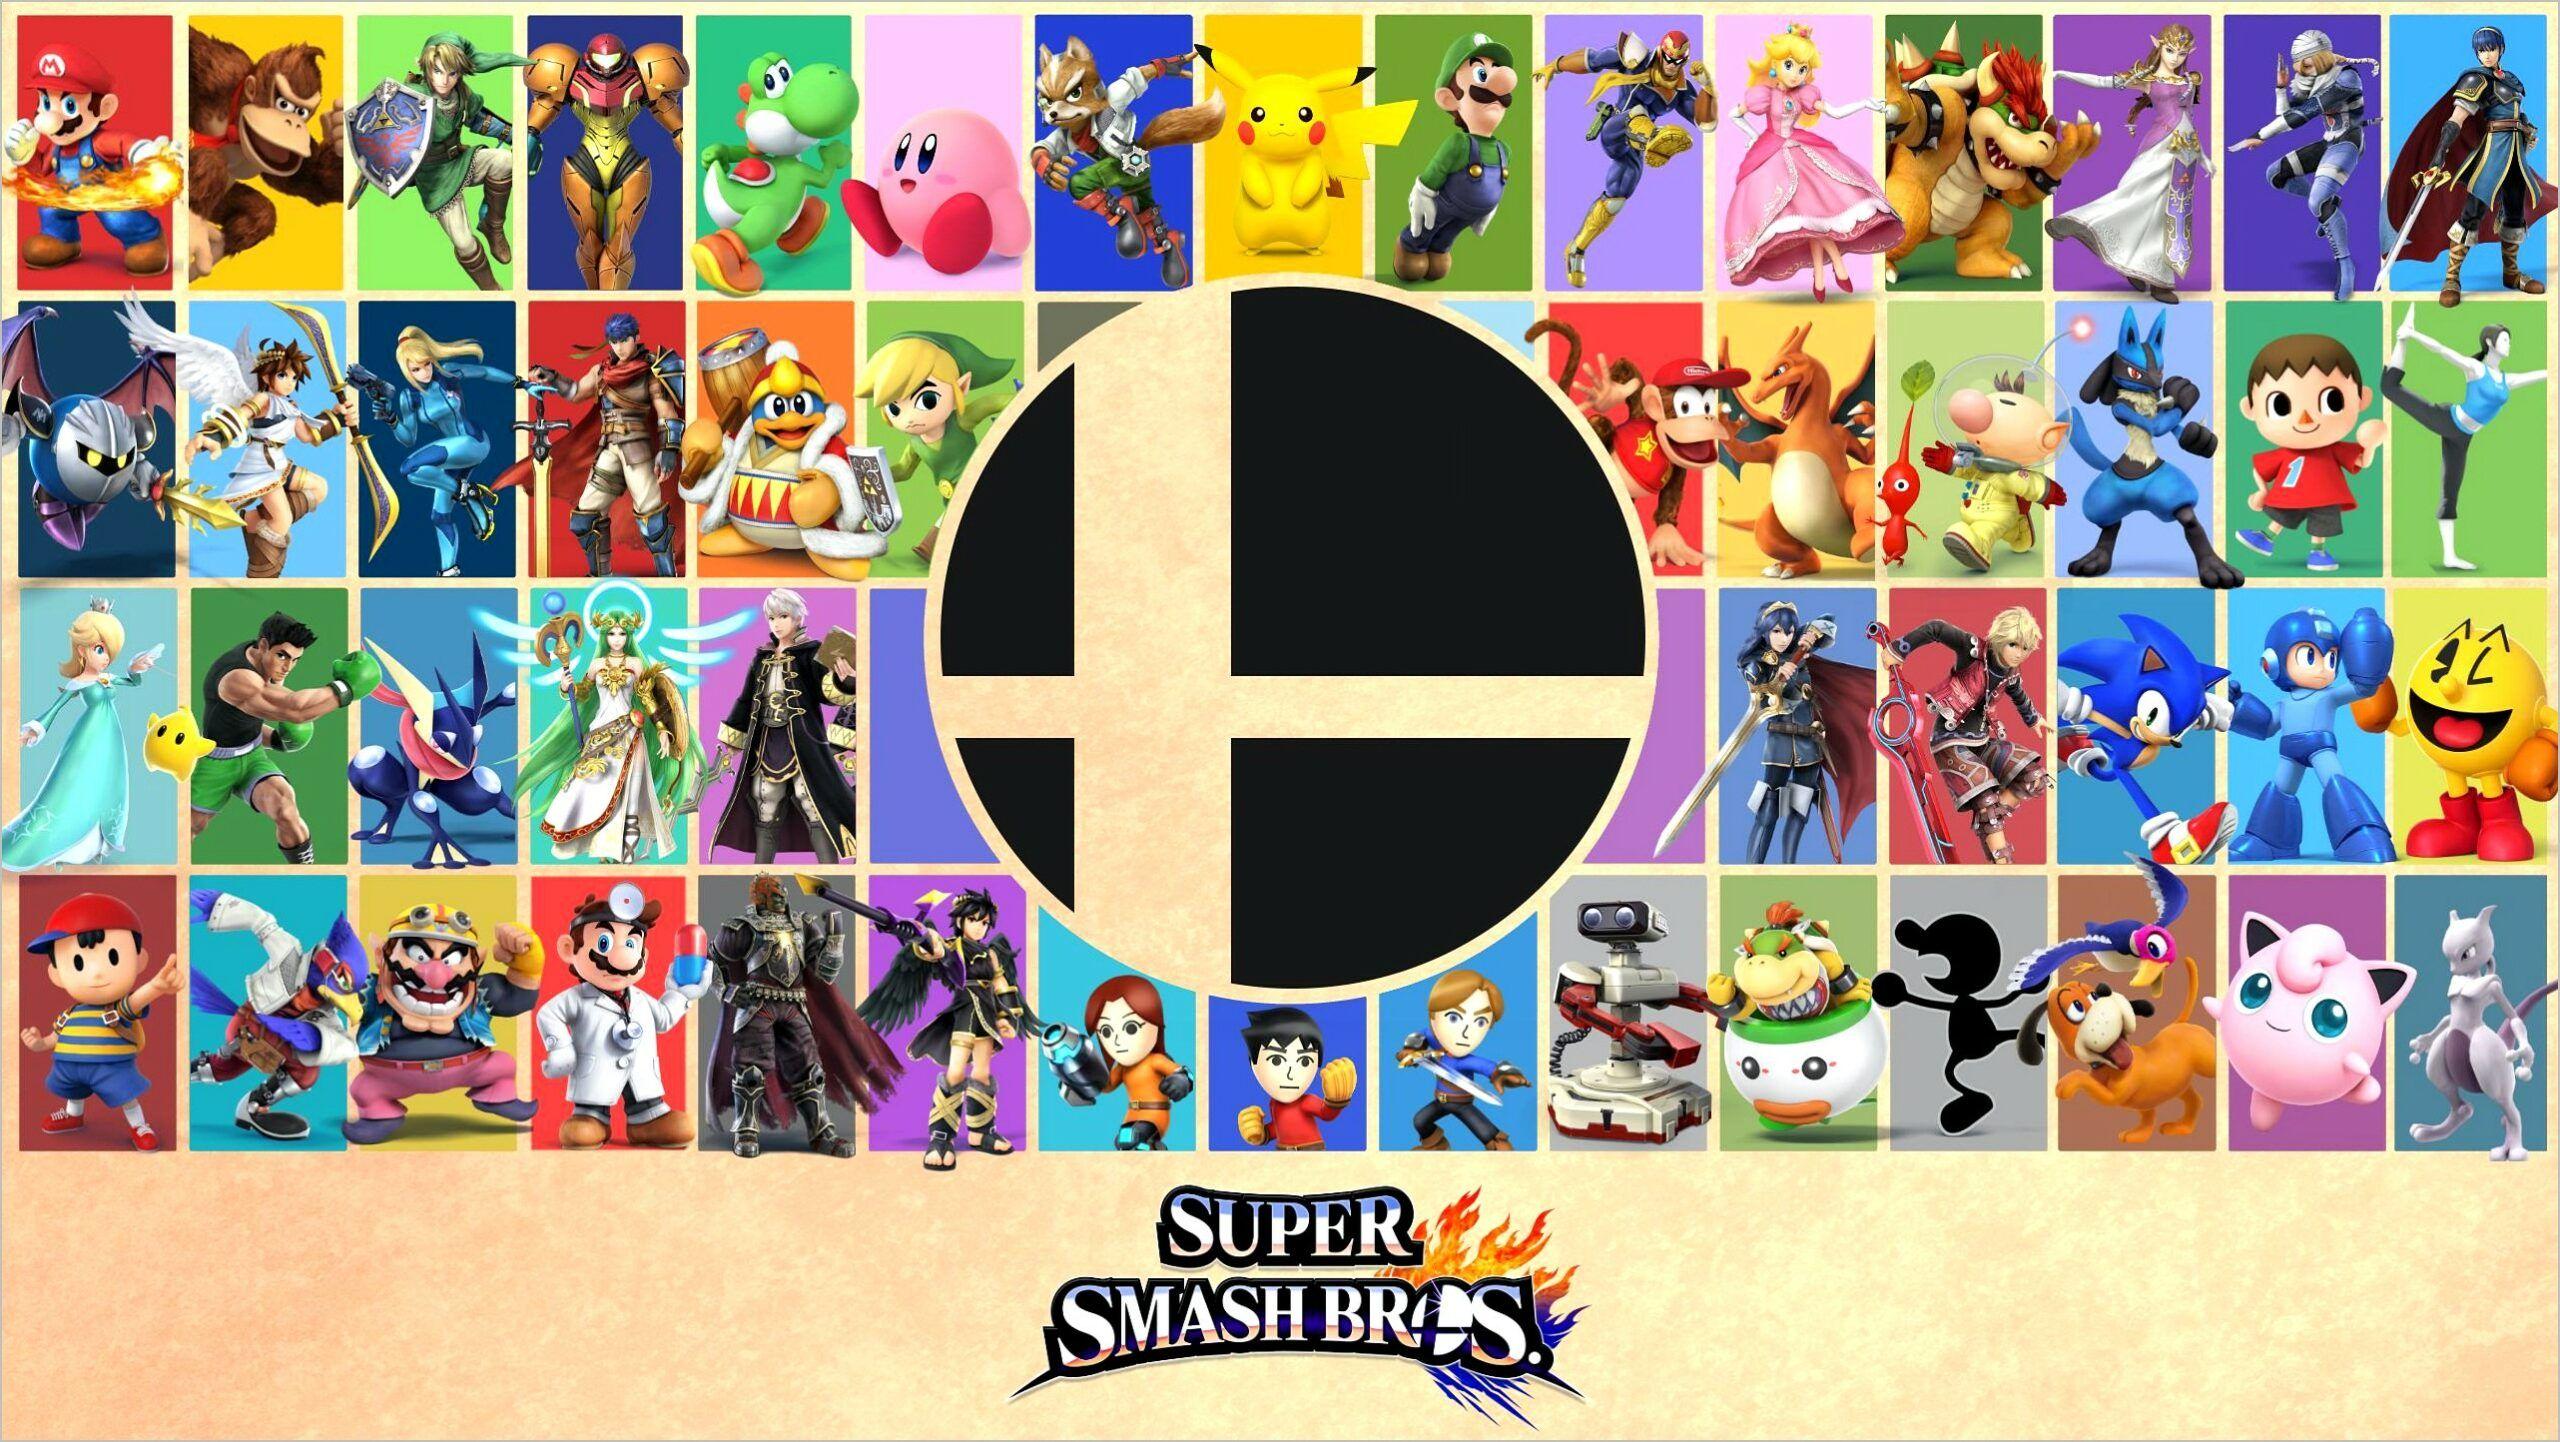 Smash 4k 1440p Wallpaper In 2020 Smash Bros Super Smash Bros Party Super Smash Bros